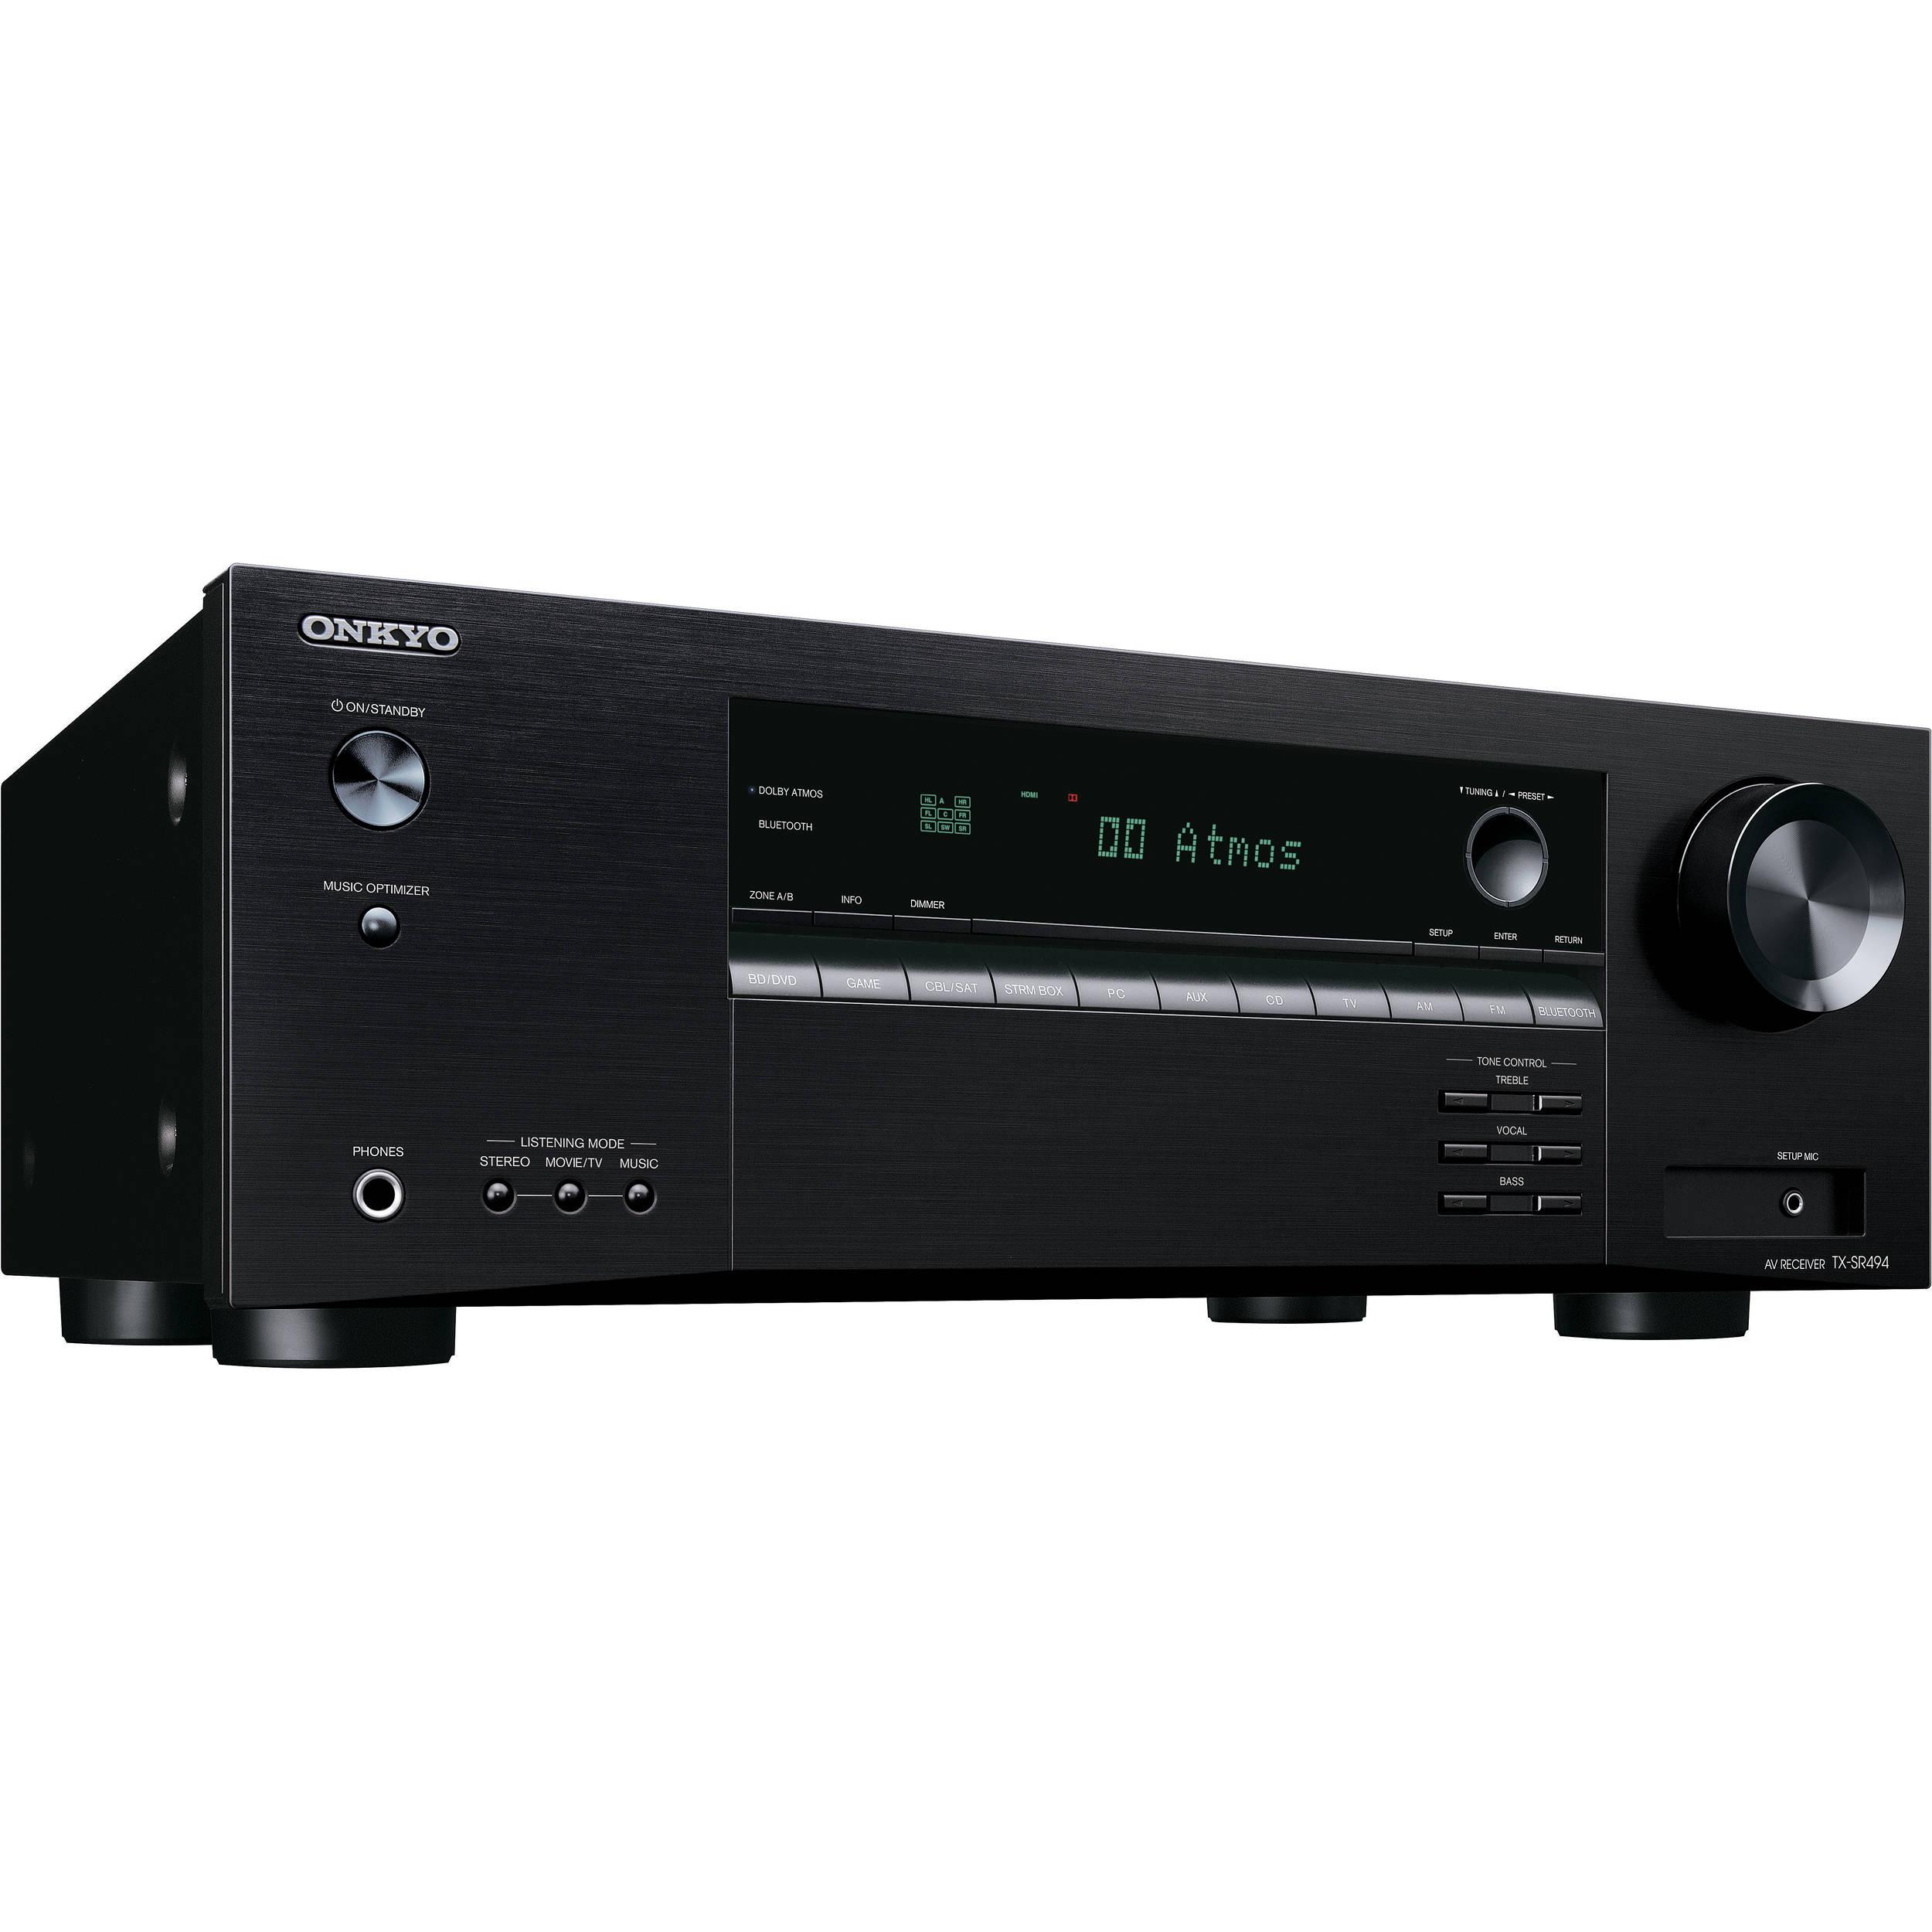 Onkyo TX-SR494 7 2-Channel A/V Receiver